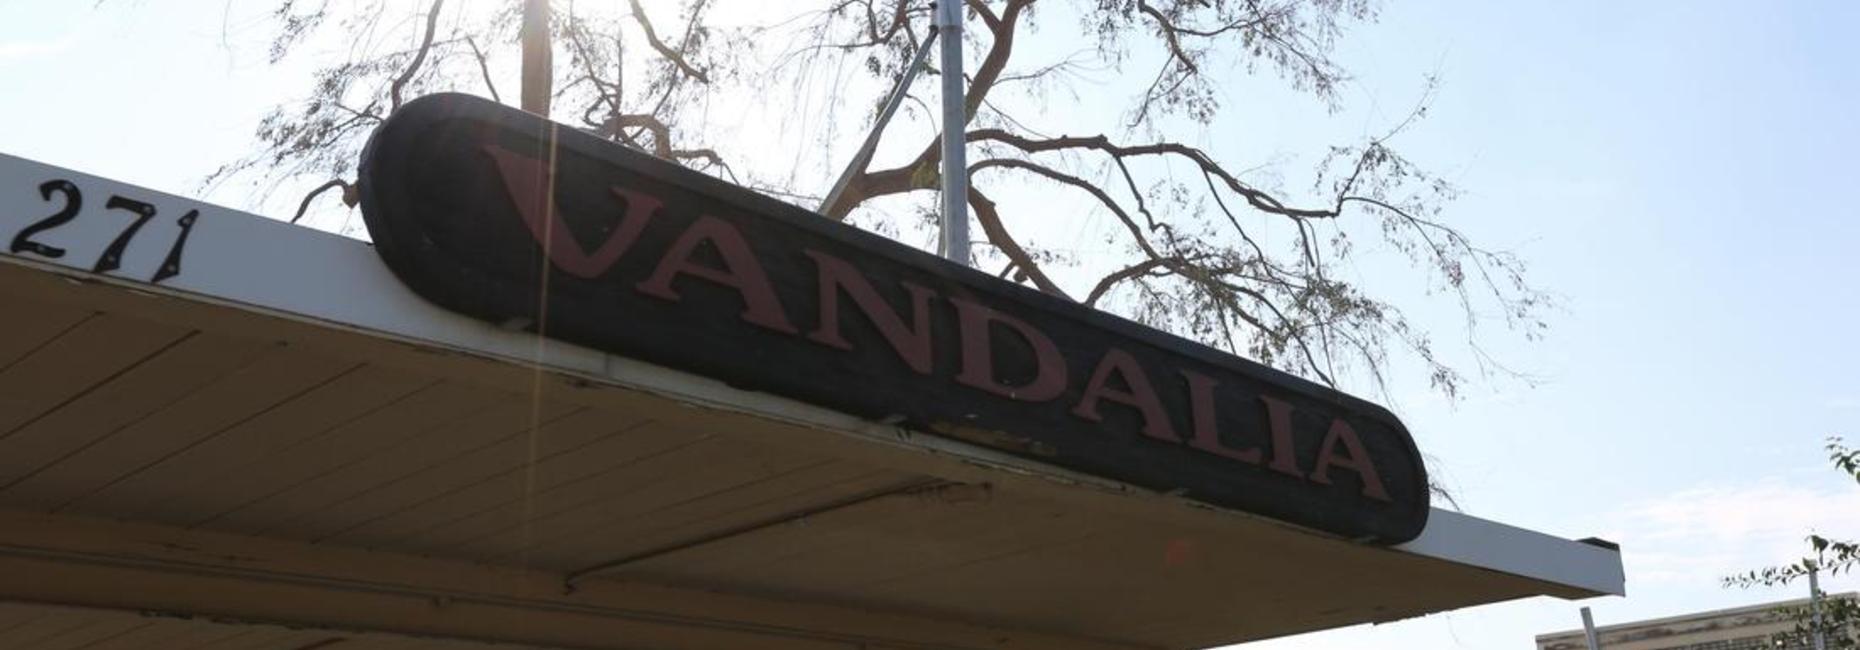 Vandalia sign